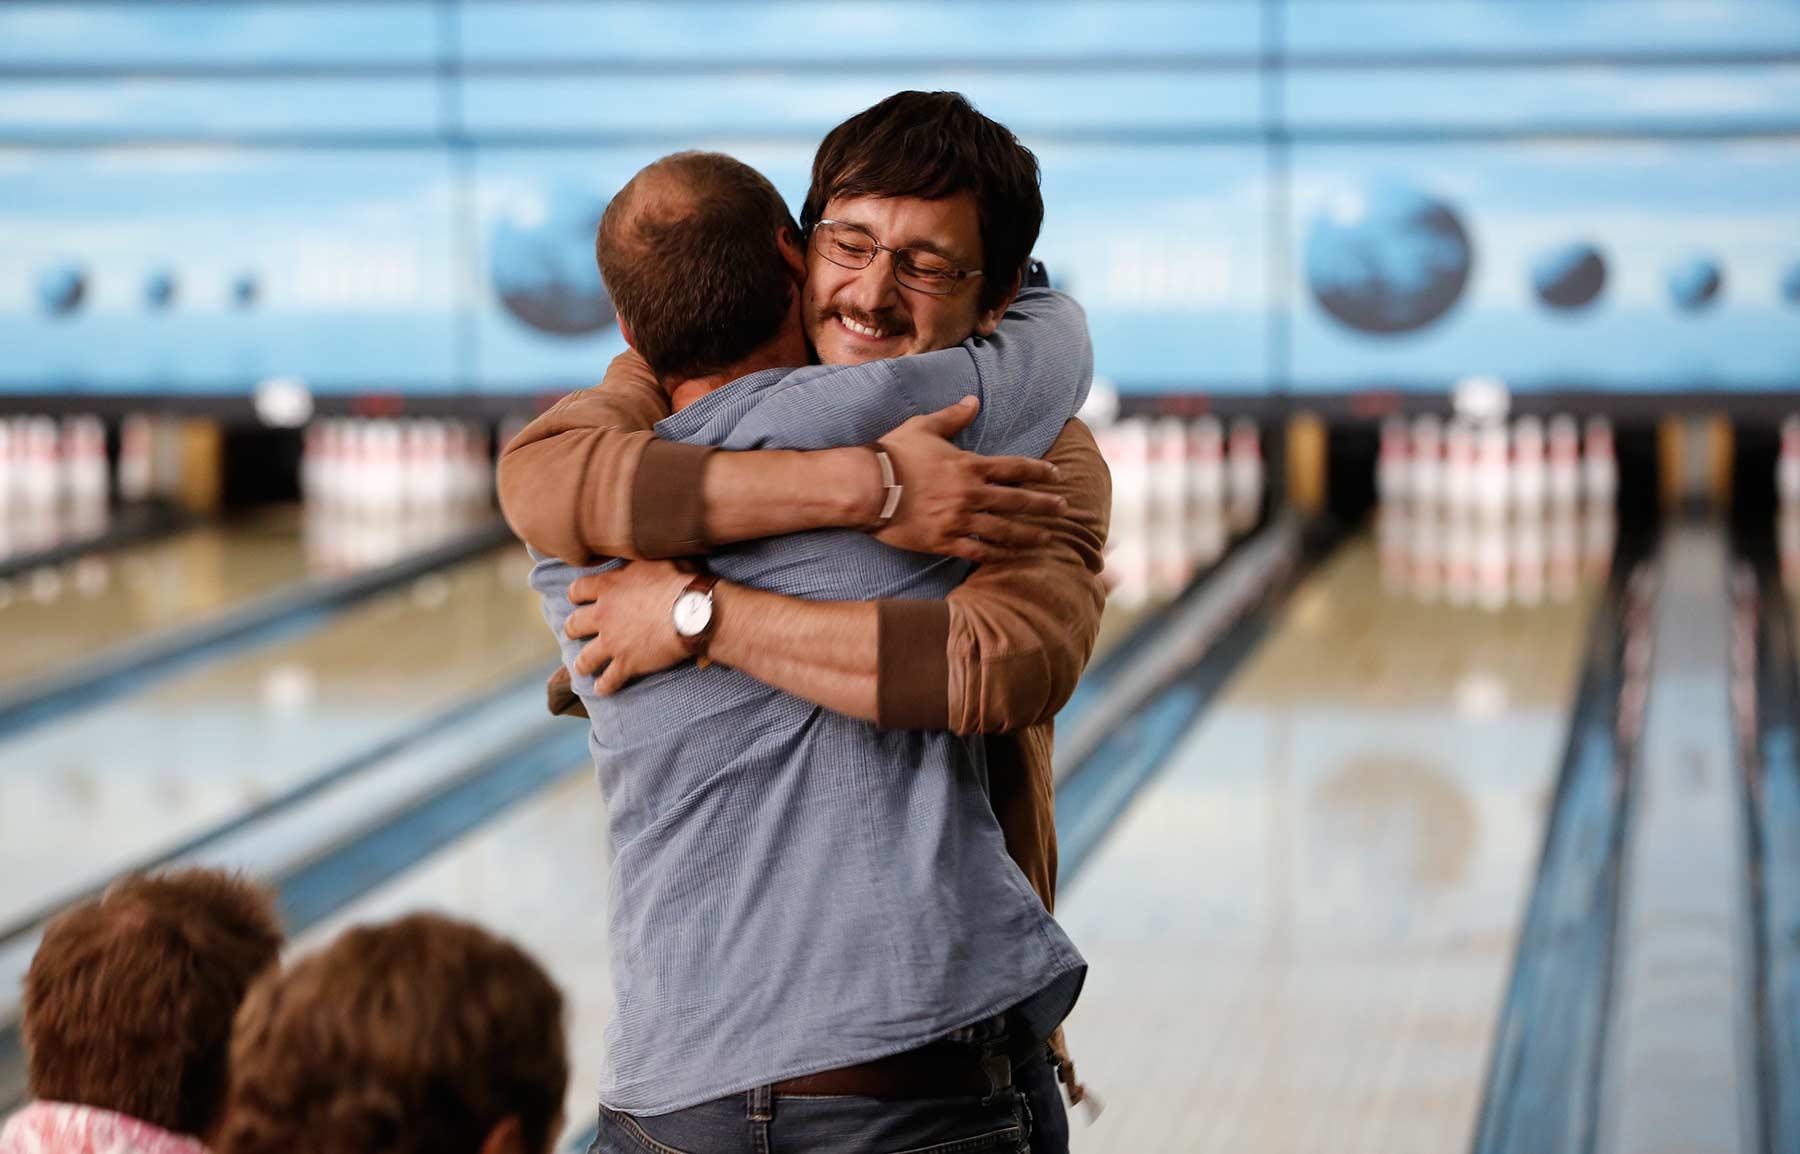 Besonderes Freundschafts-Geschenk: die DANKE-MILLION Tipp24-DankeMillion_02